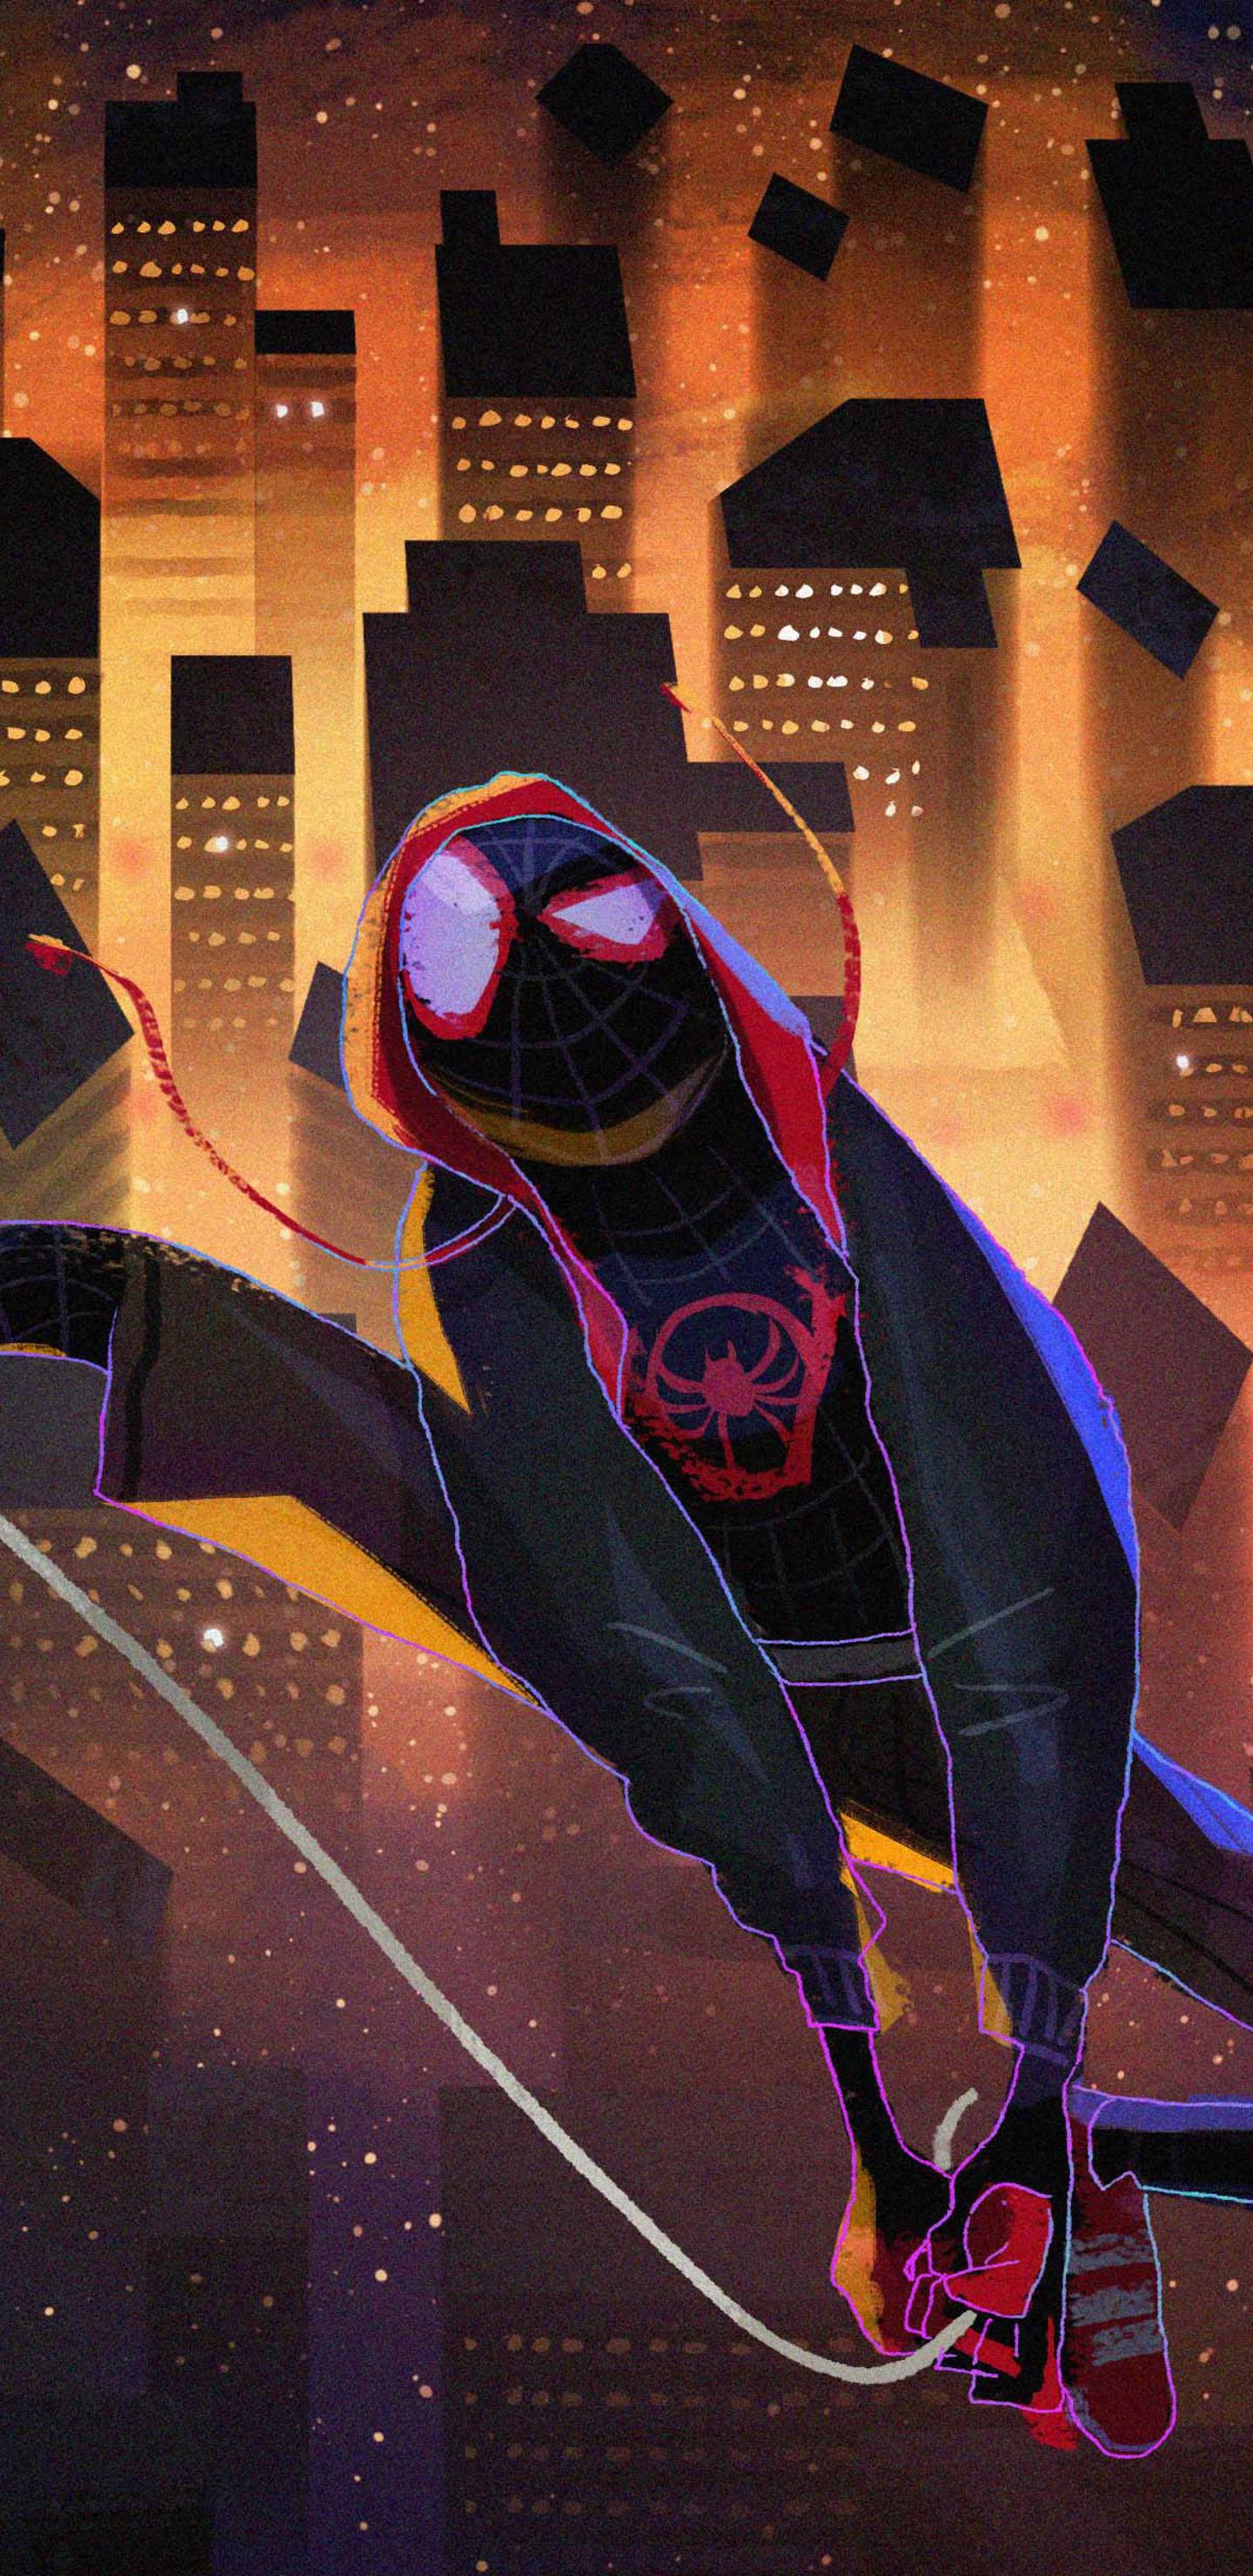 spider-man-universe-illustration-x9.jpg